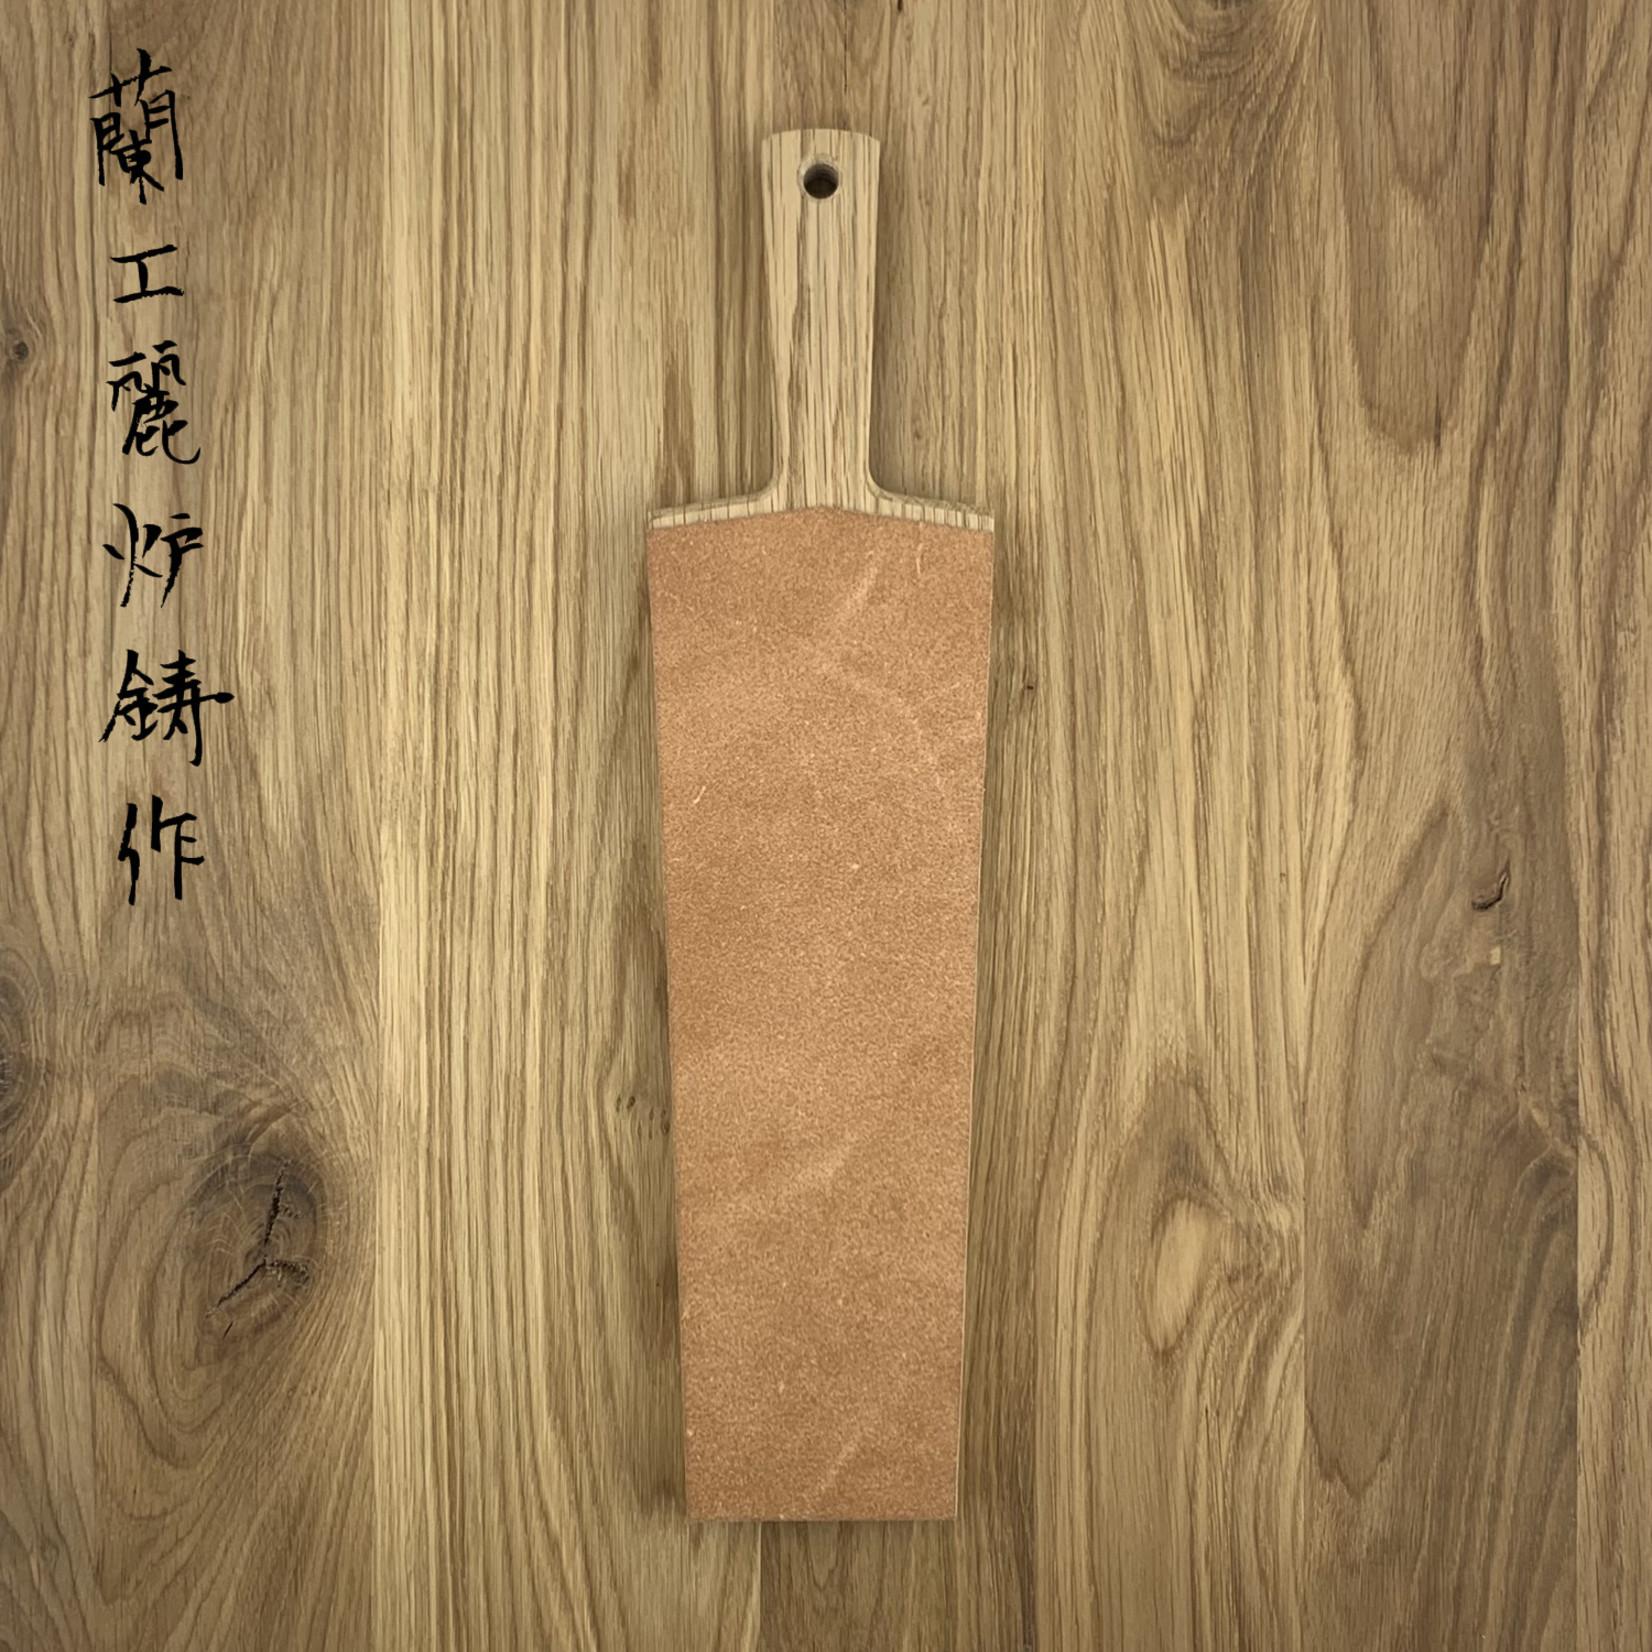 Blenheim leather stropping block 250 mm